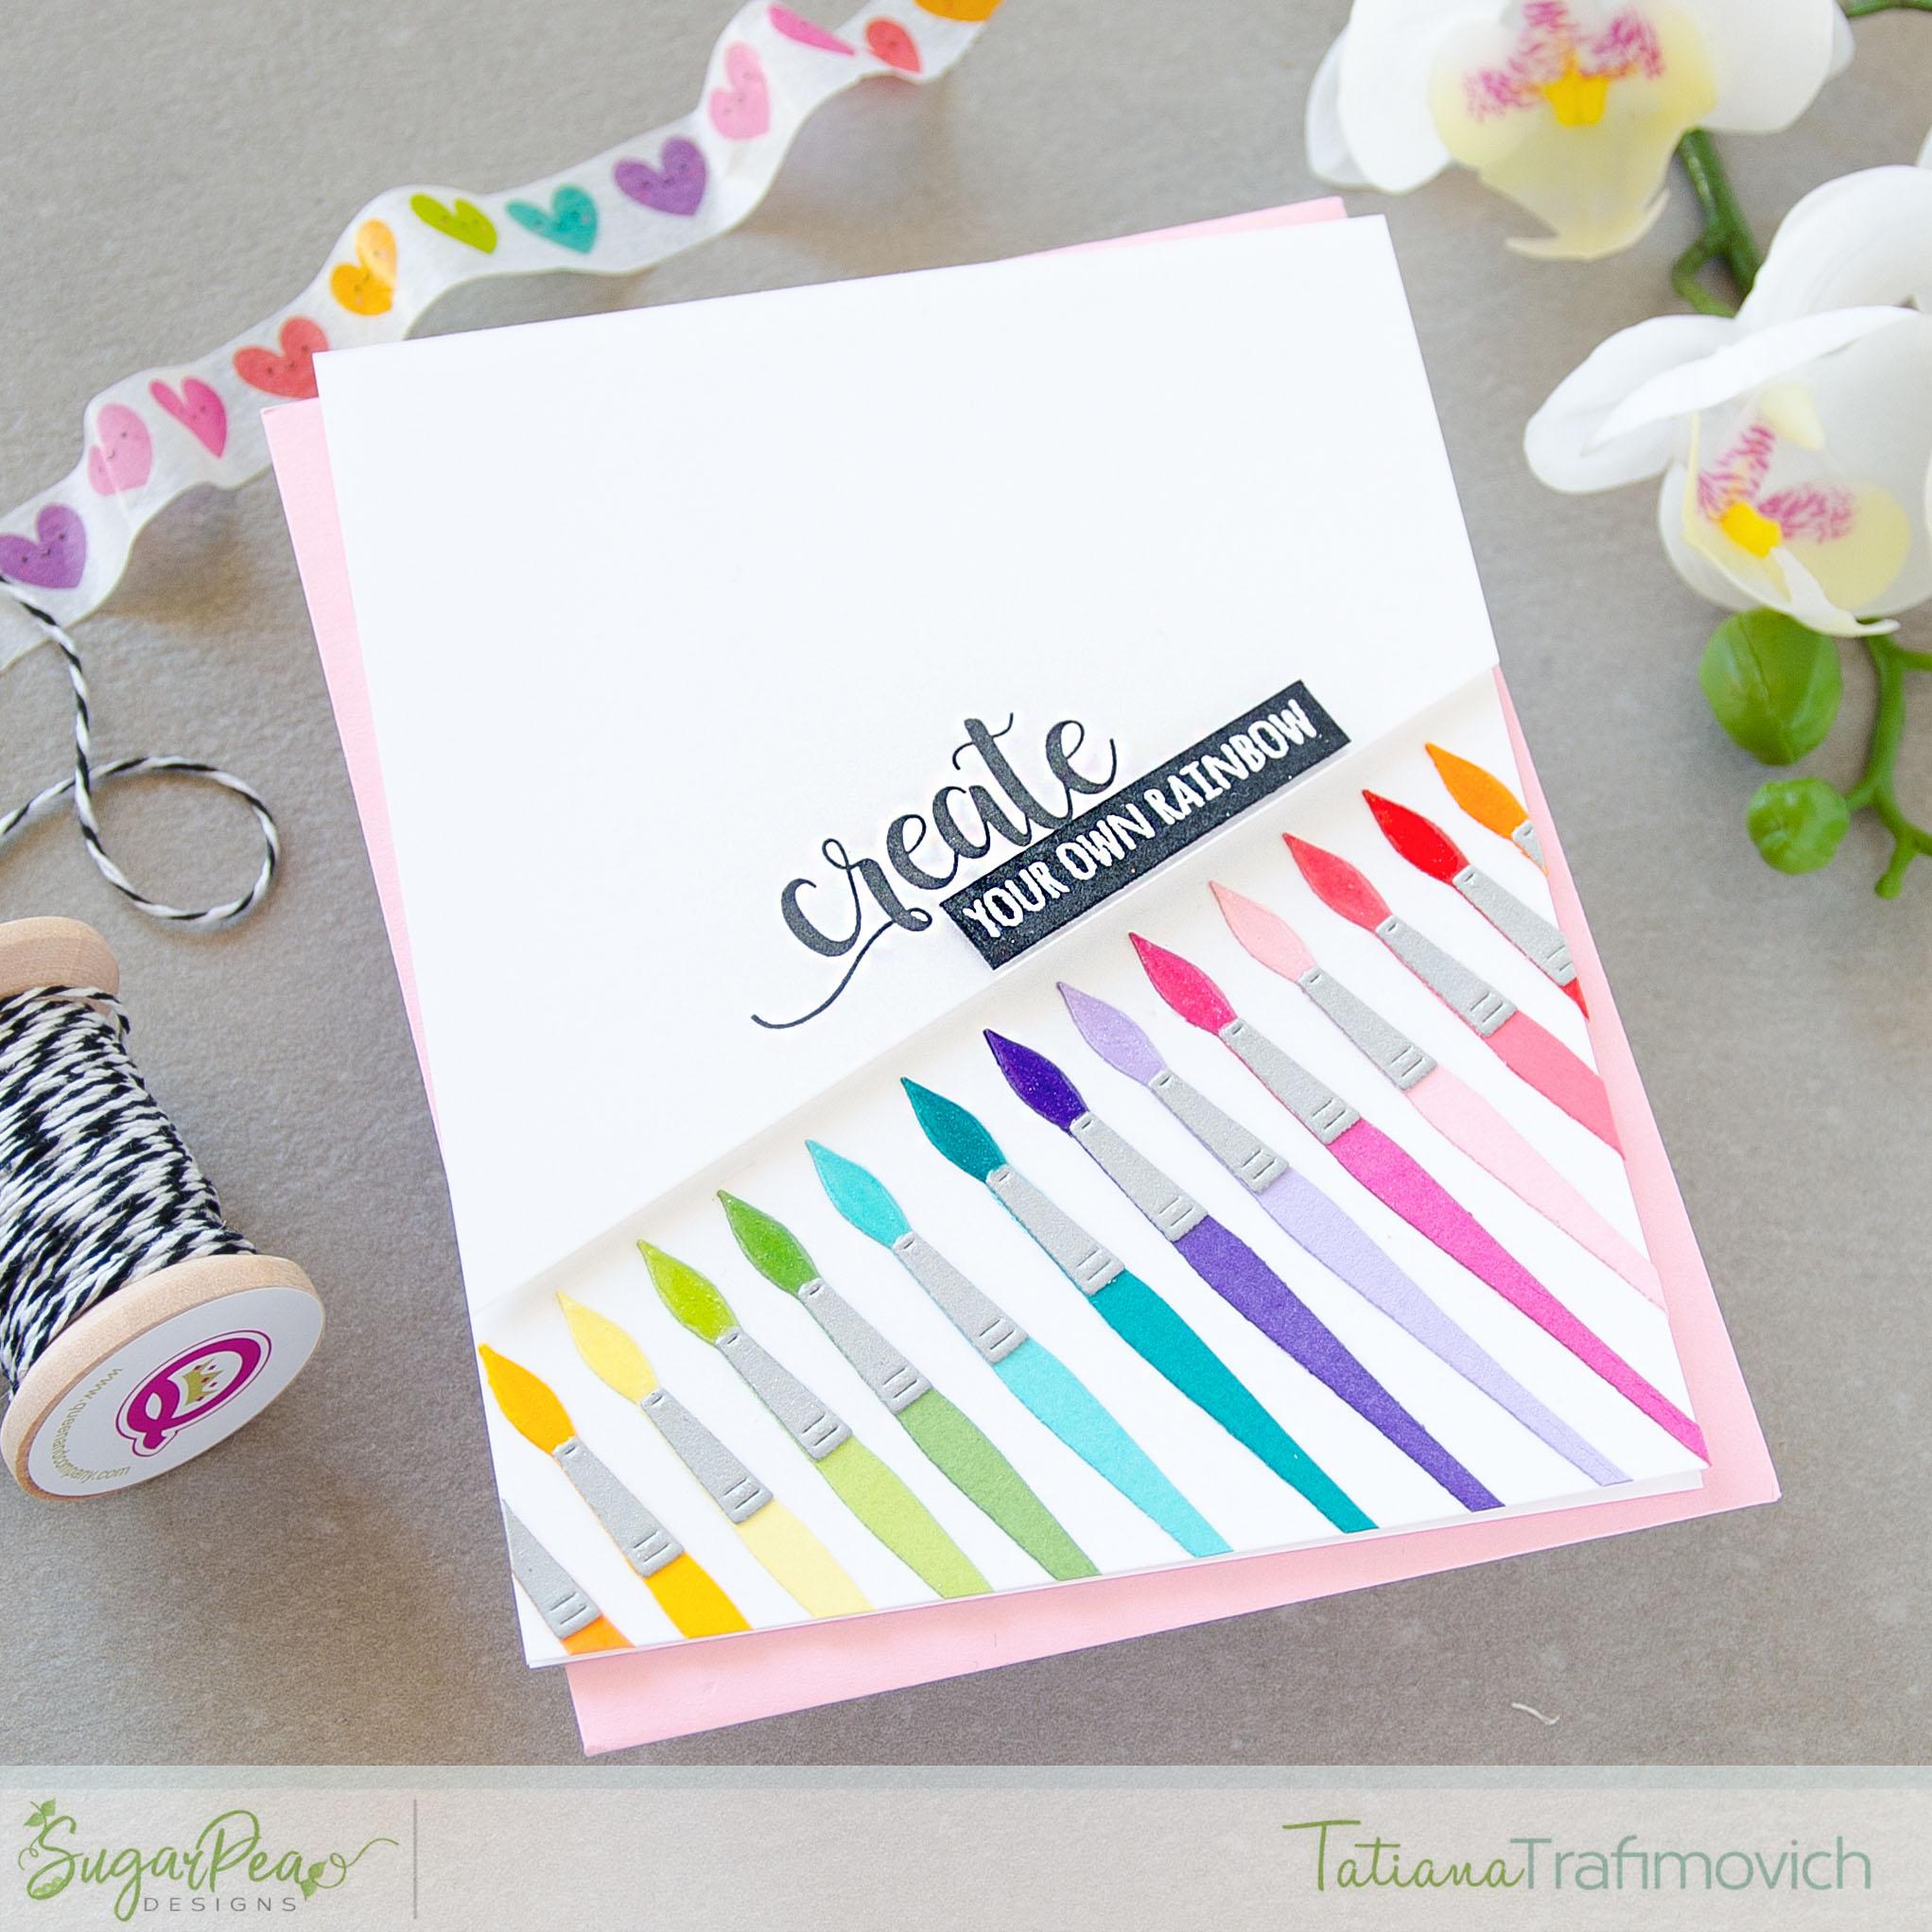 Create Your Own Rainbow #handmade card by Tatiana Trafimovich #tatianacraftandart - Paint Palette Die by SugarPea Designs #sugarpeadesigns